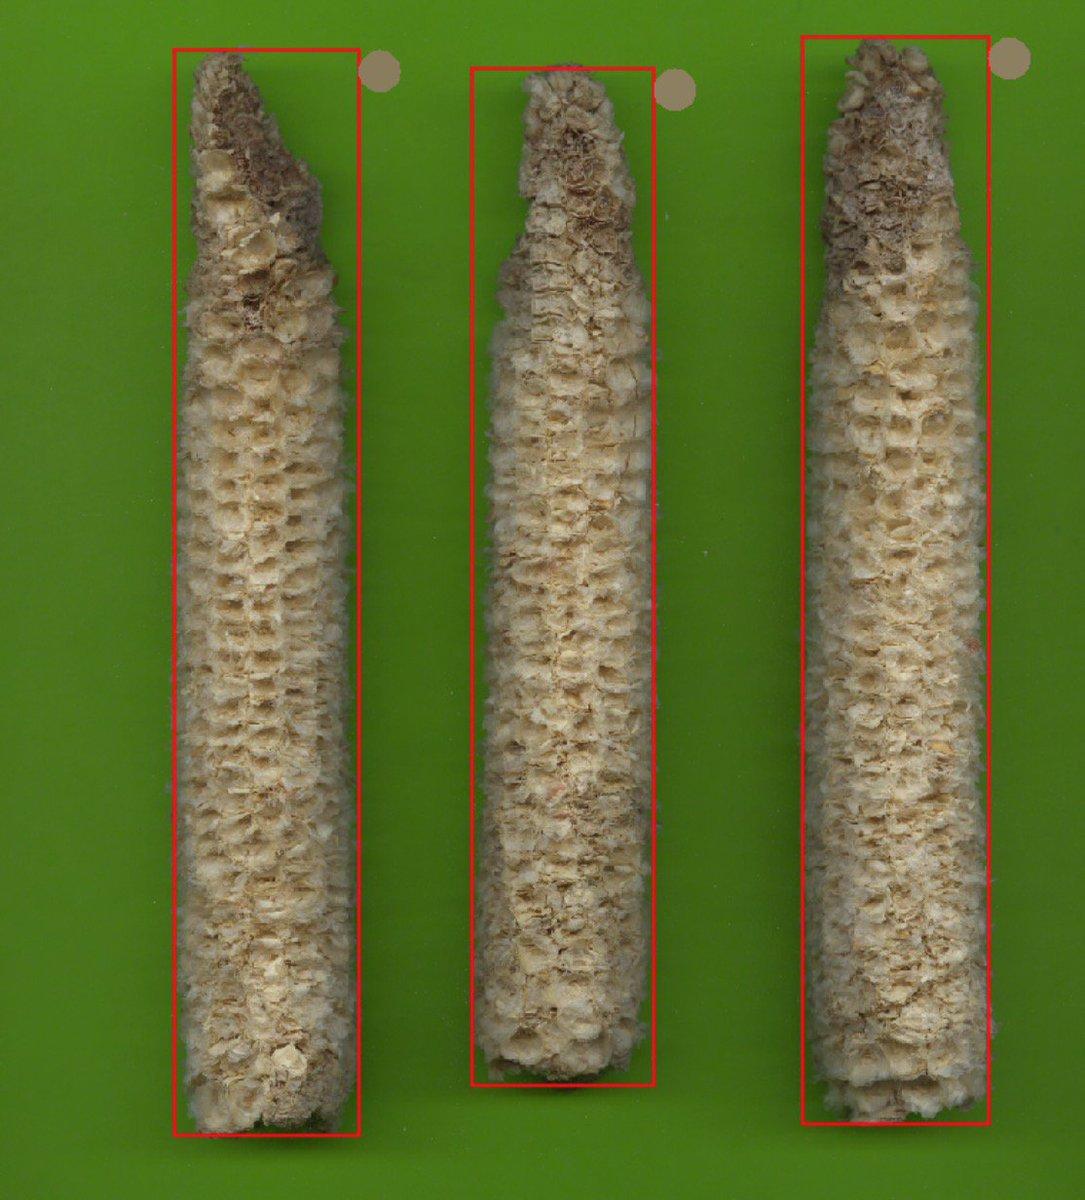 Plant Image Analysis on Twitter: